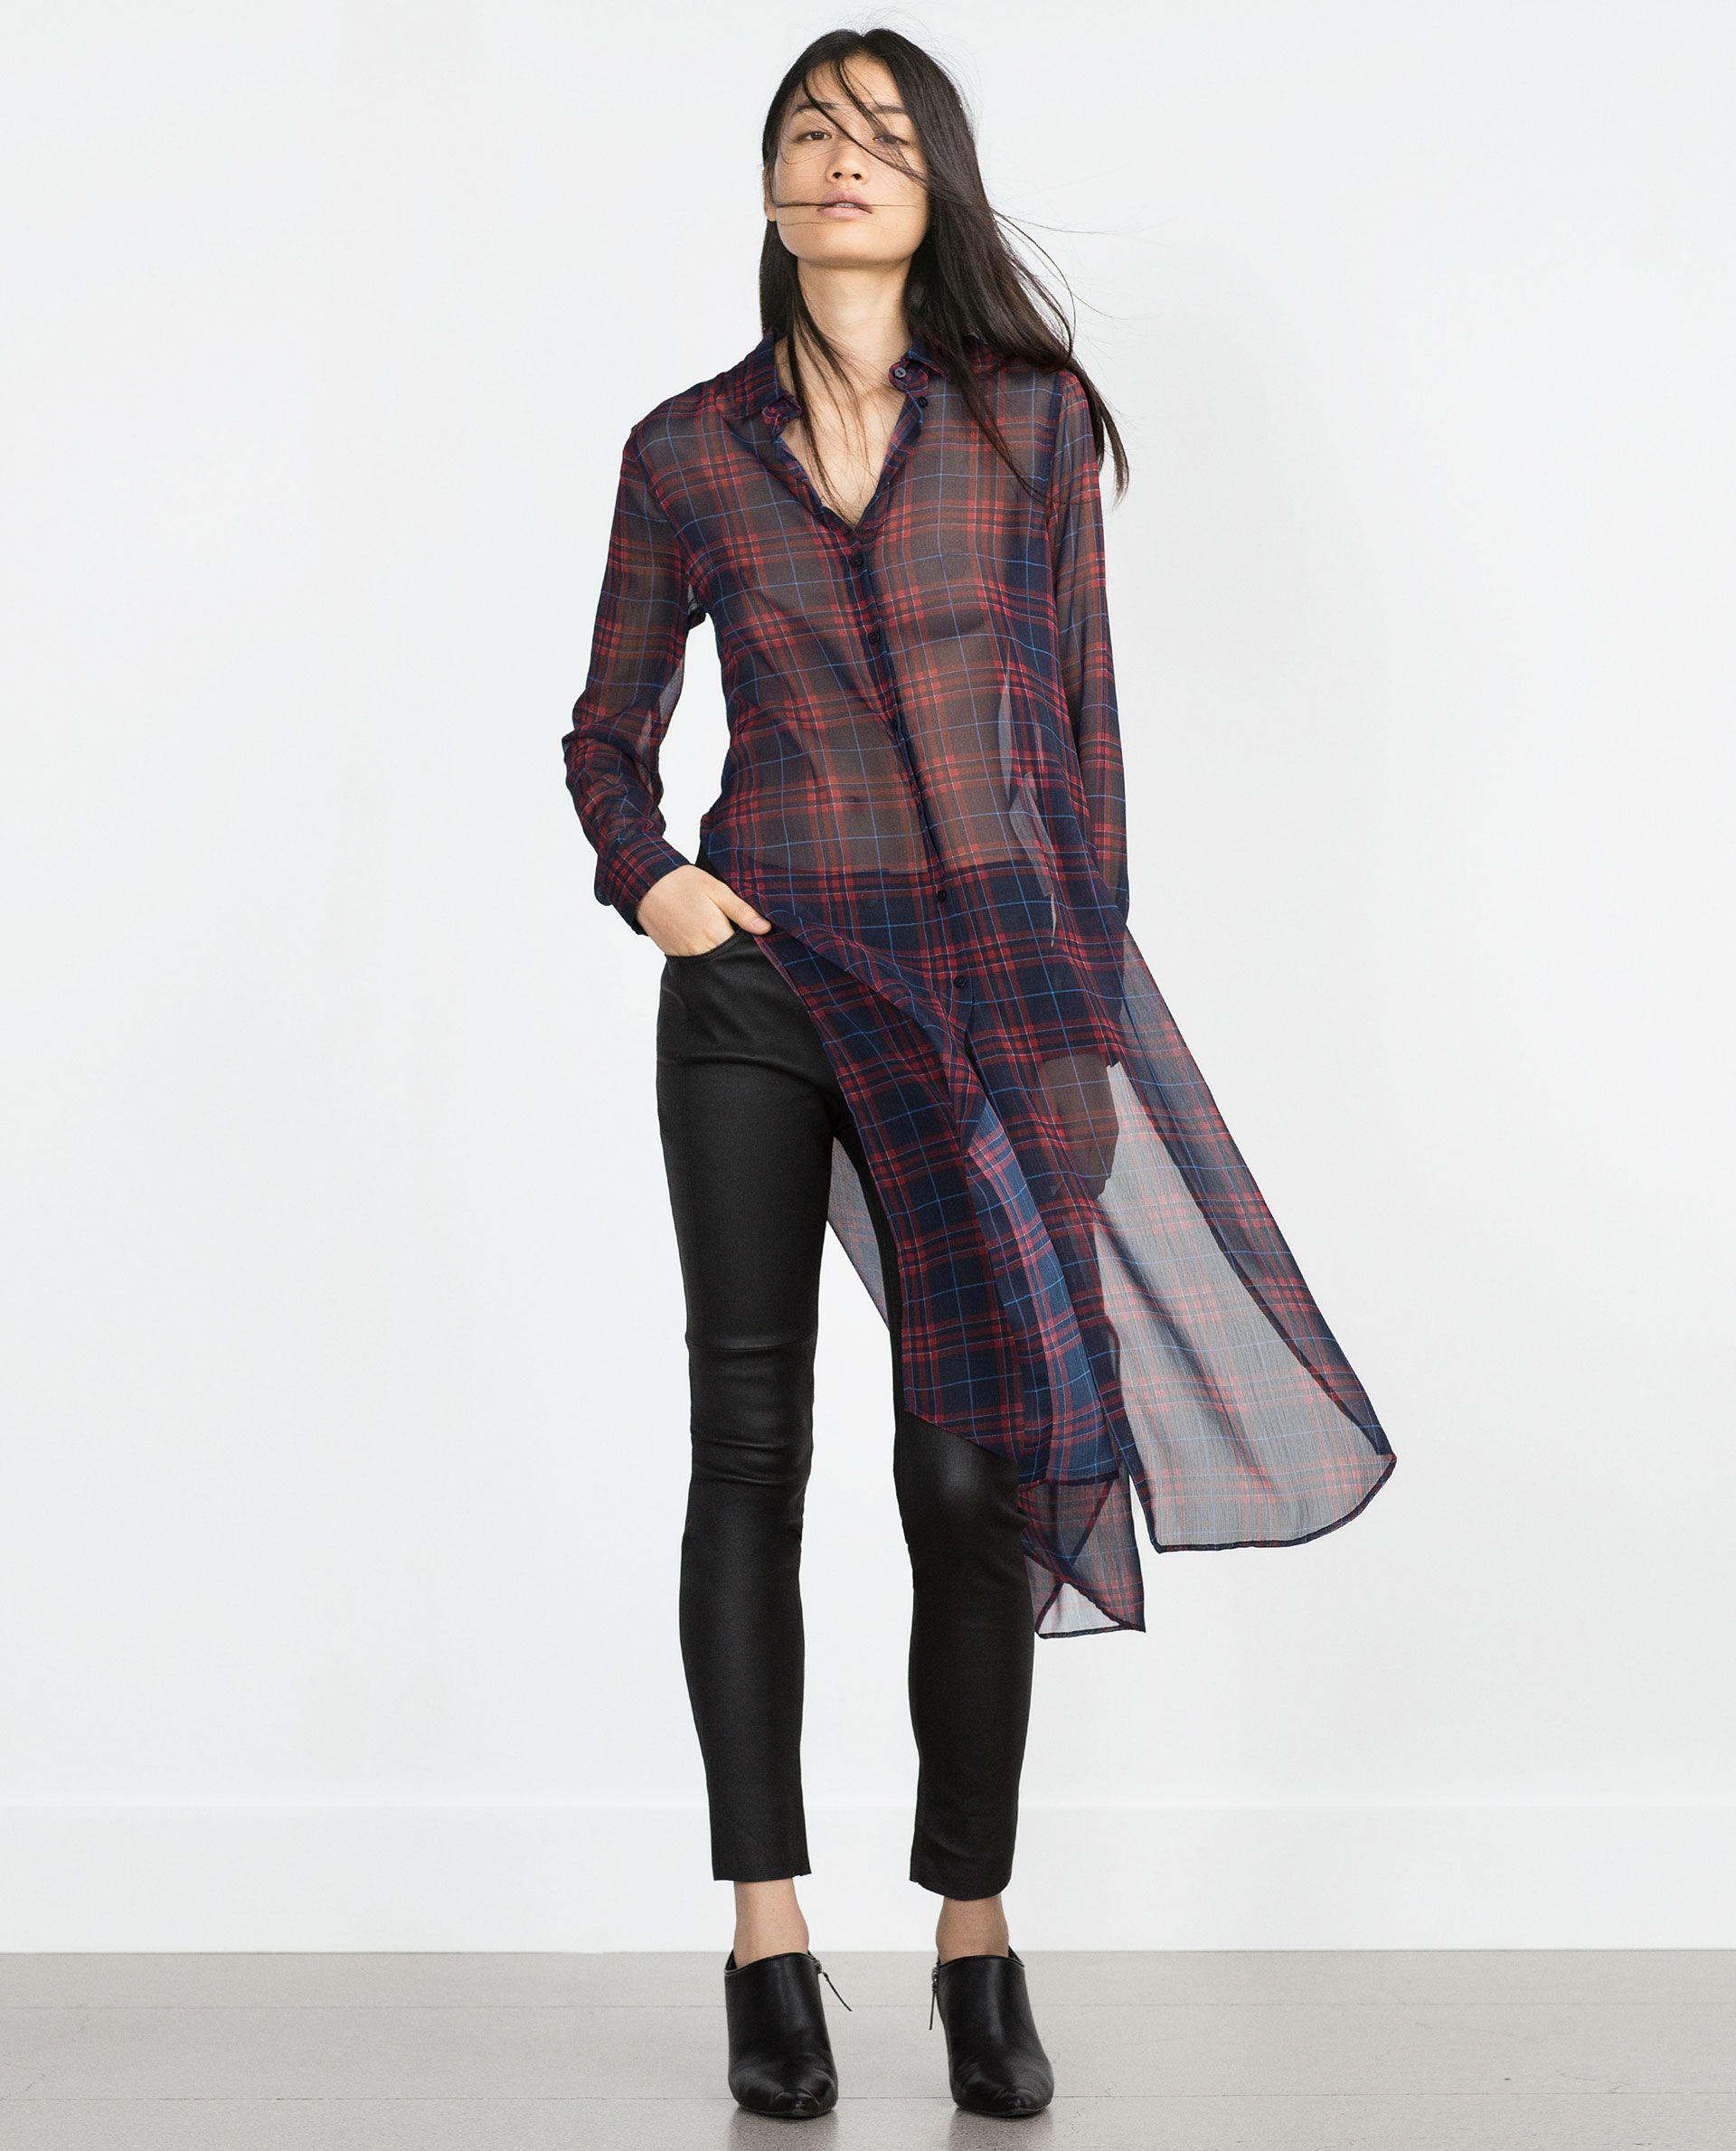 Chaise longue Impuestos Fresco  CAMISA LARGA ESTAMPADA - Ver todo - Camisas - MUJER | Lange blouse, Blouse,  Blouses